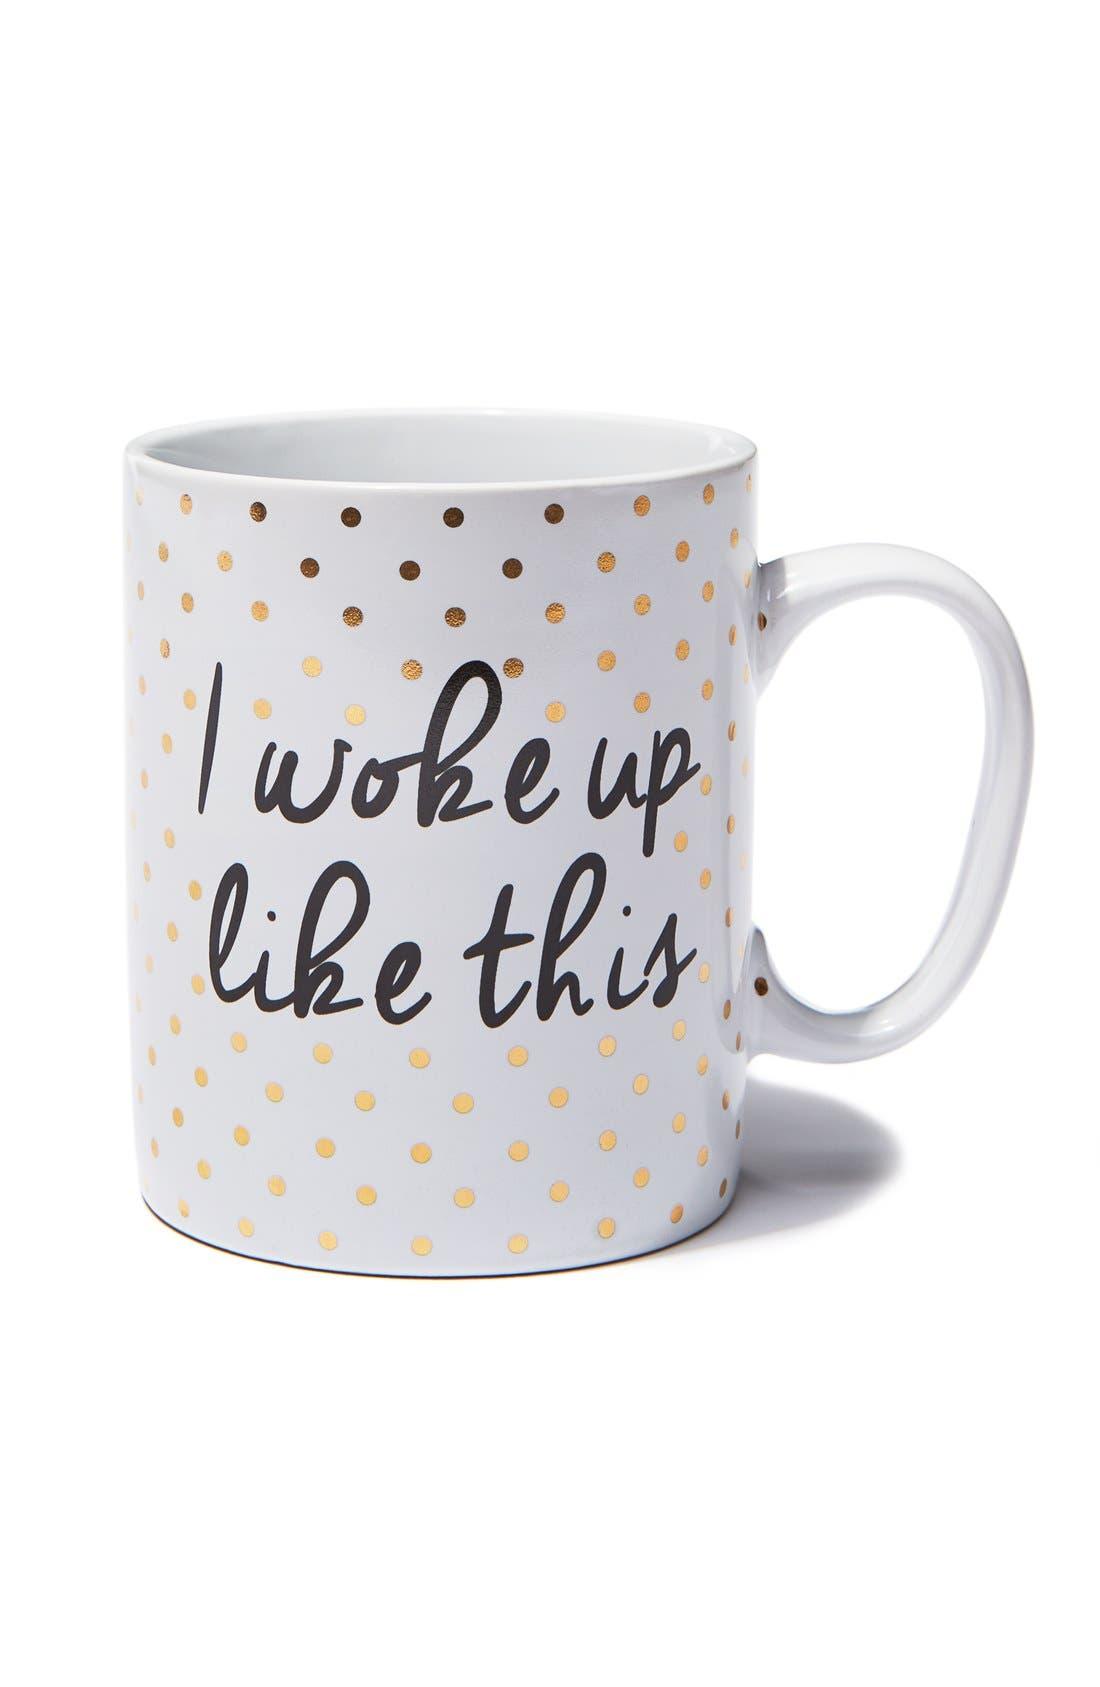 'I Woke Up Like This' Mug,                             Alternate thumbnail 2, color,                             710